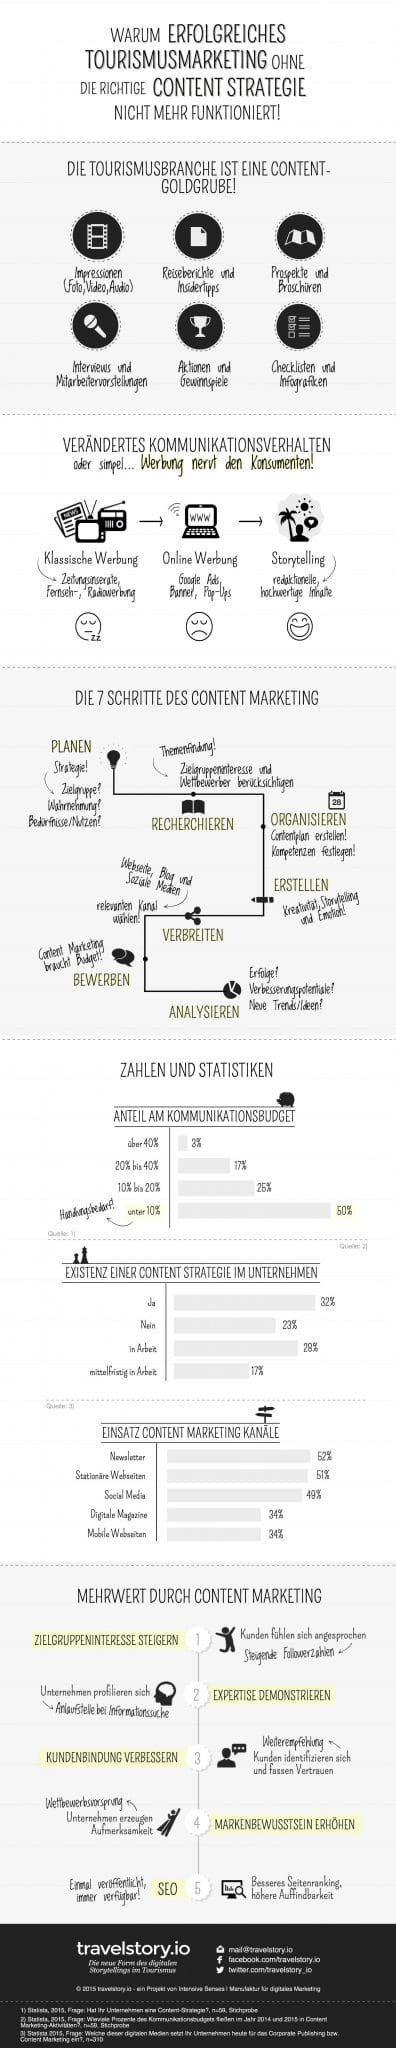 Infografik Content Marketing im Tourismus